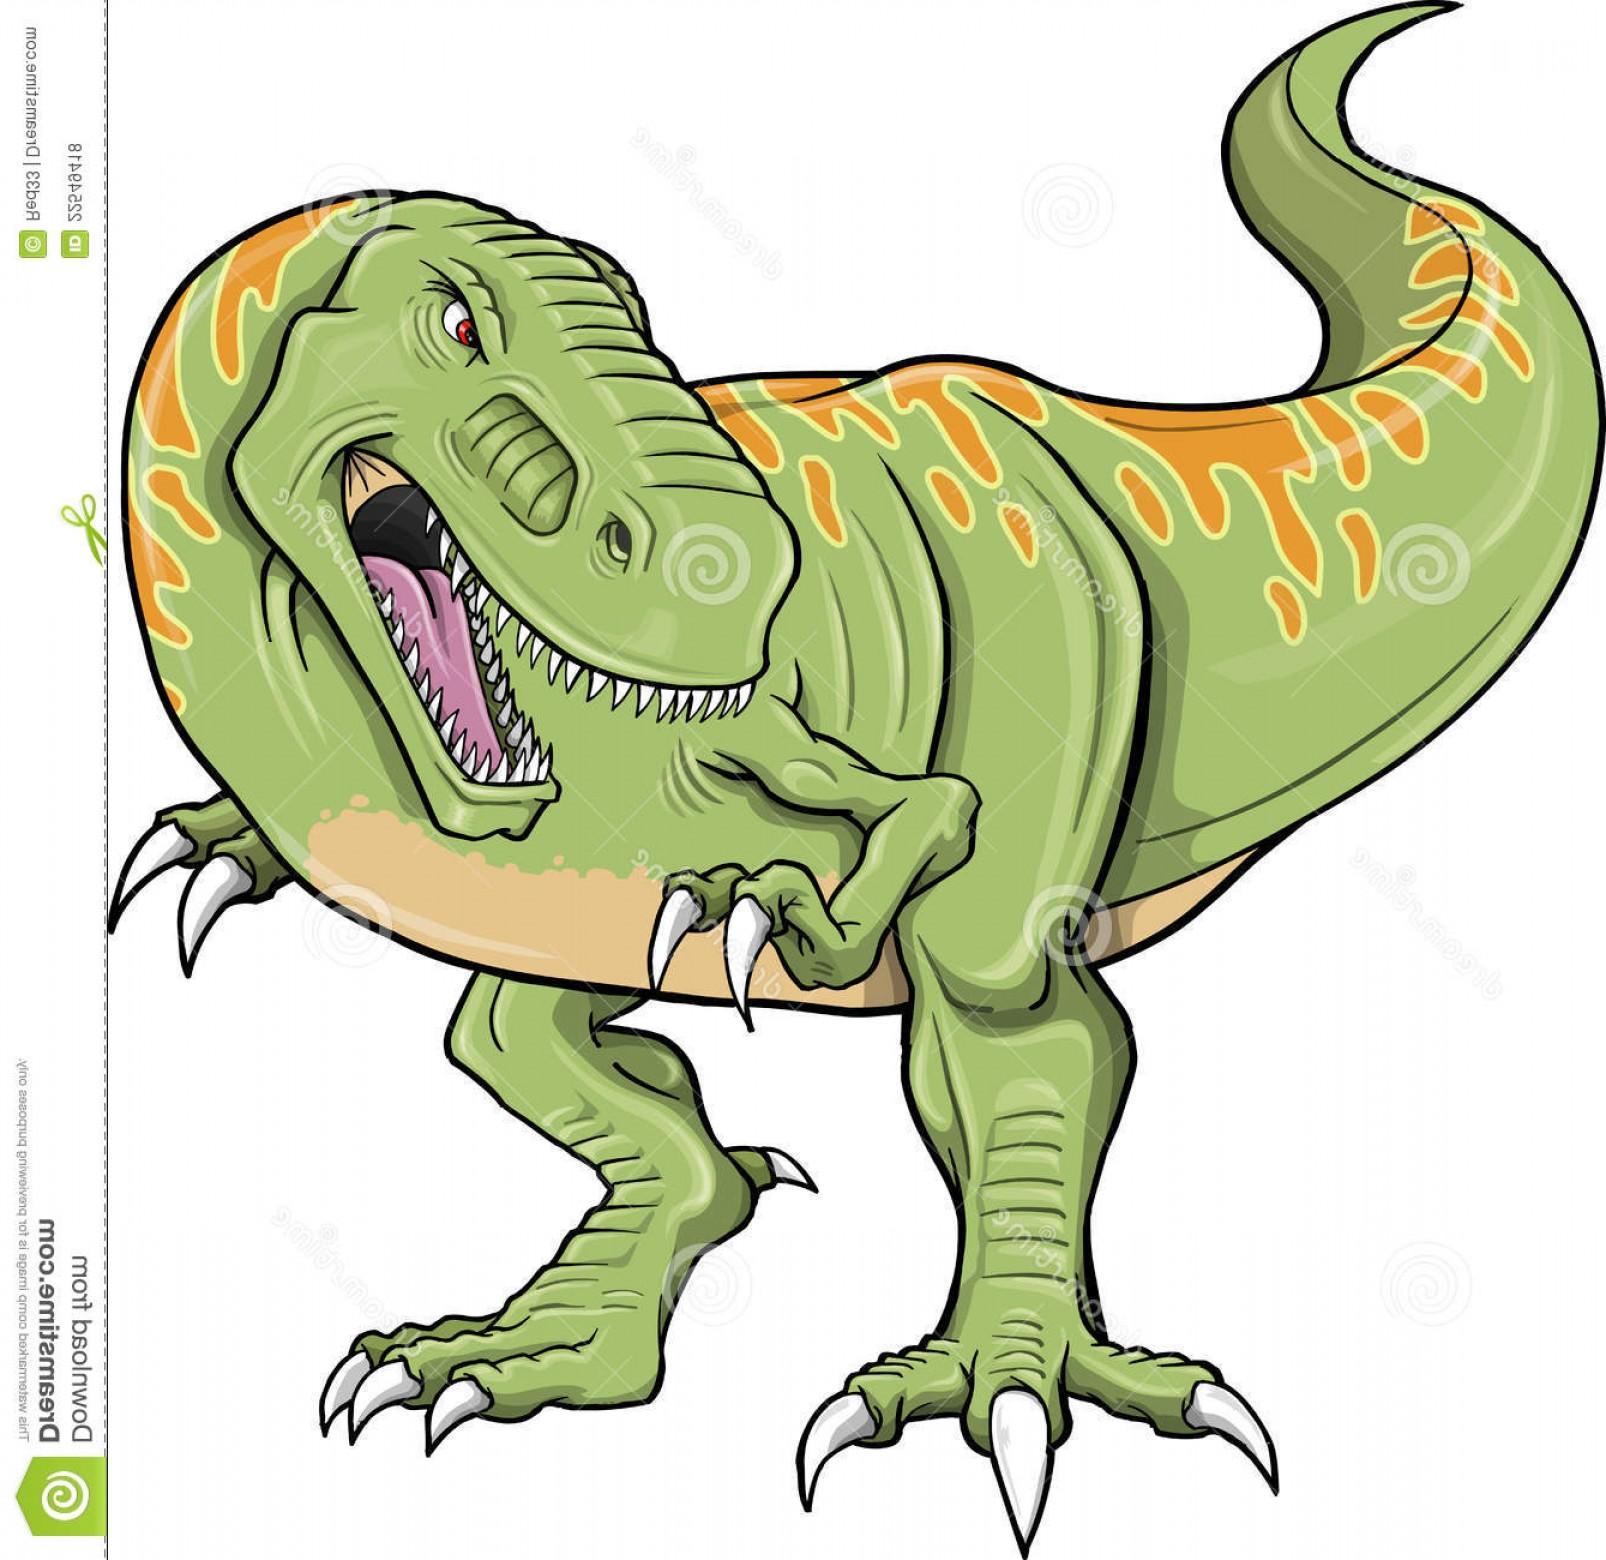 1606x1560 Royalty Free Stock Photos Tyrannosaurus Dinosaur T Rex Vector